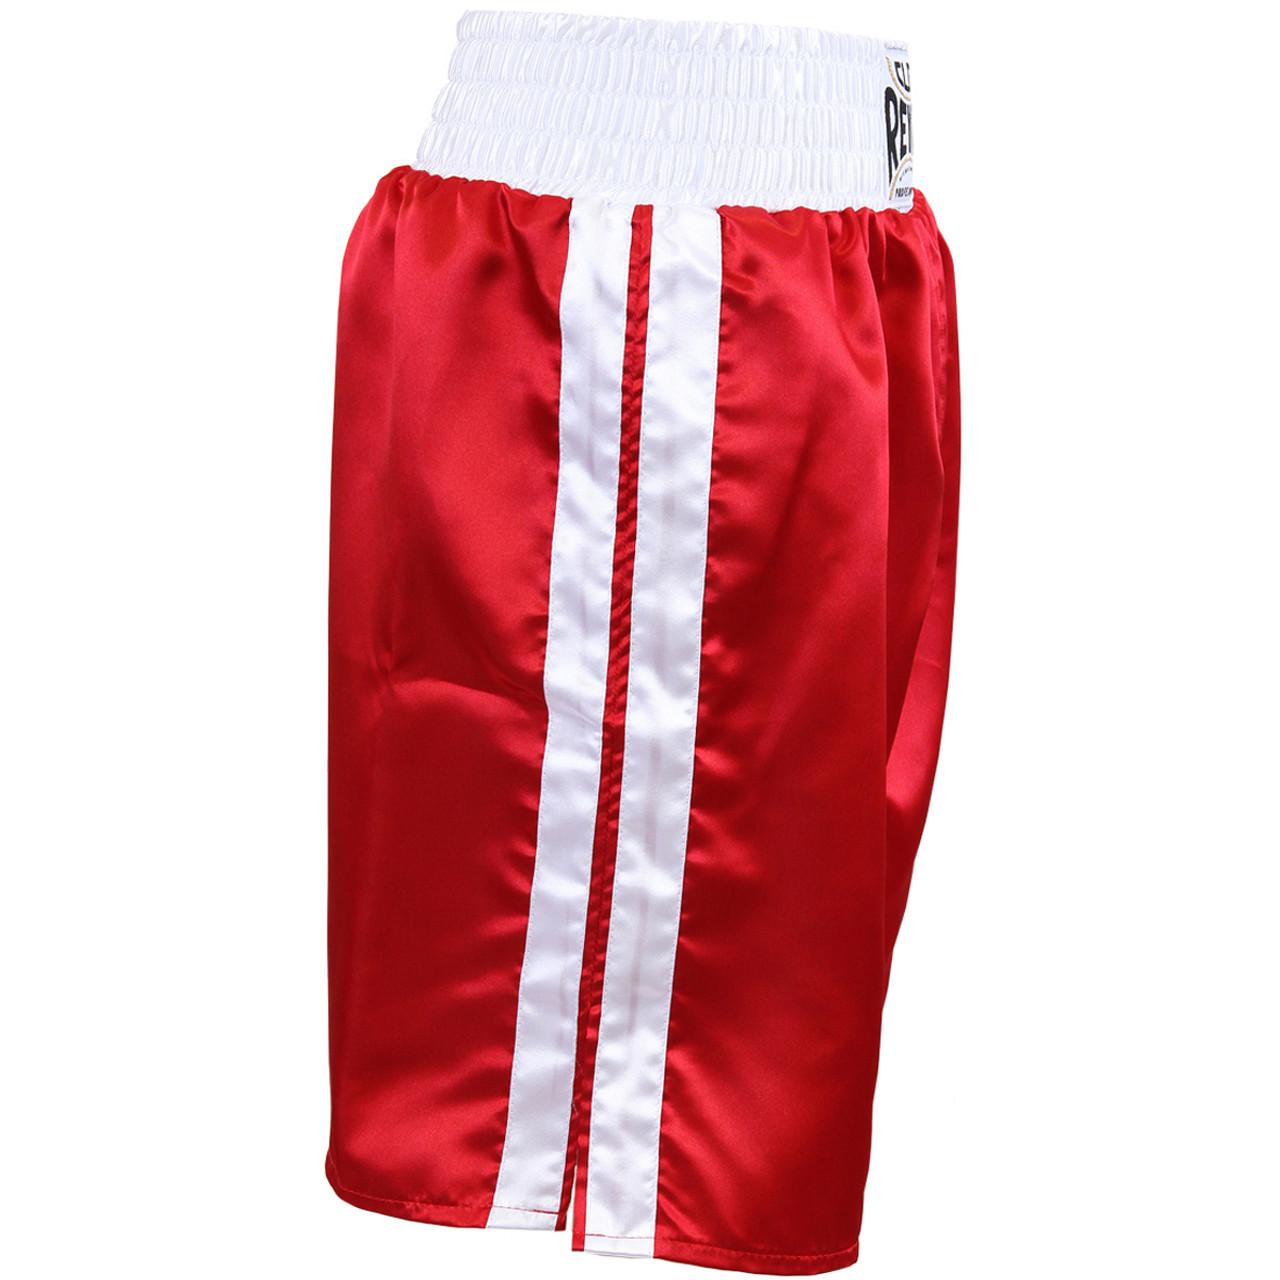 Cleto Reyes Satin Classic Boxing Trunks Black//White